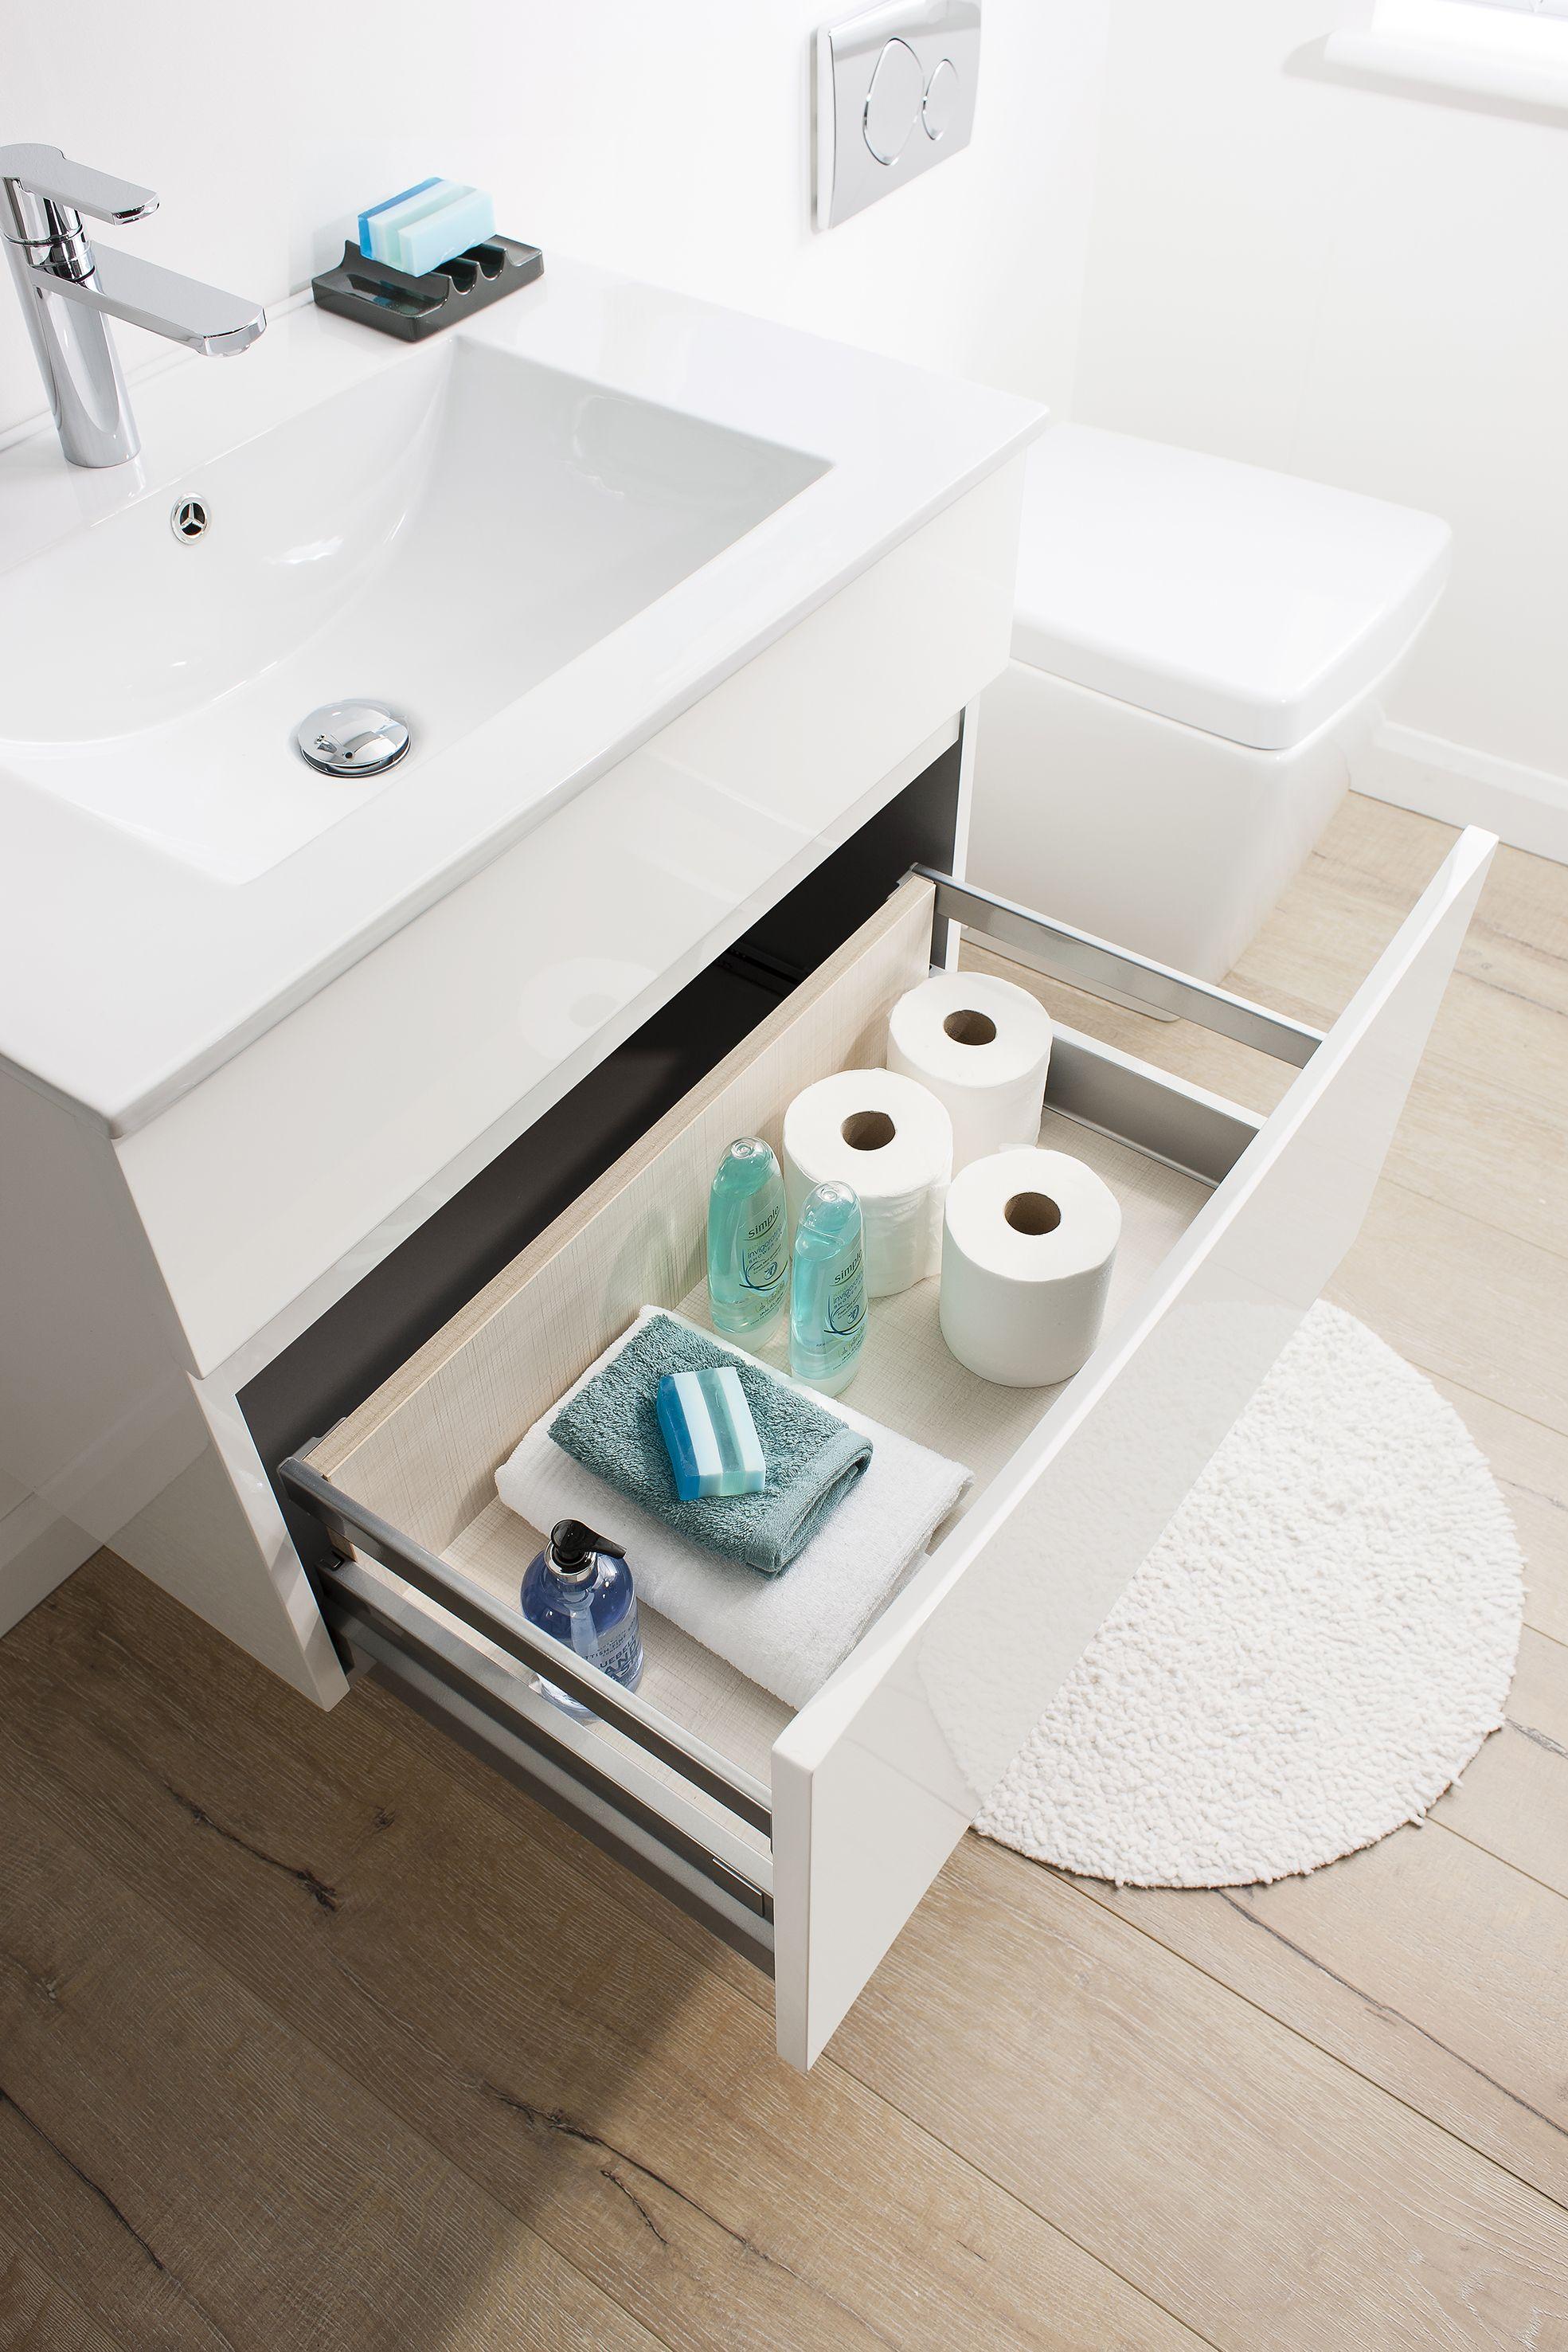 Glide II White Gloss Bathroom Furniture Unit & Ceramic Basin from ...